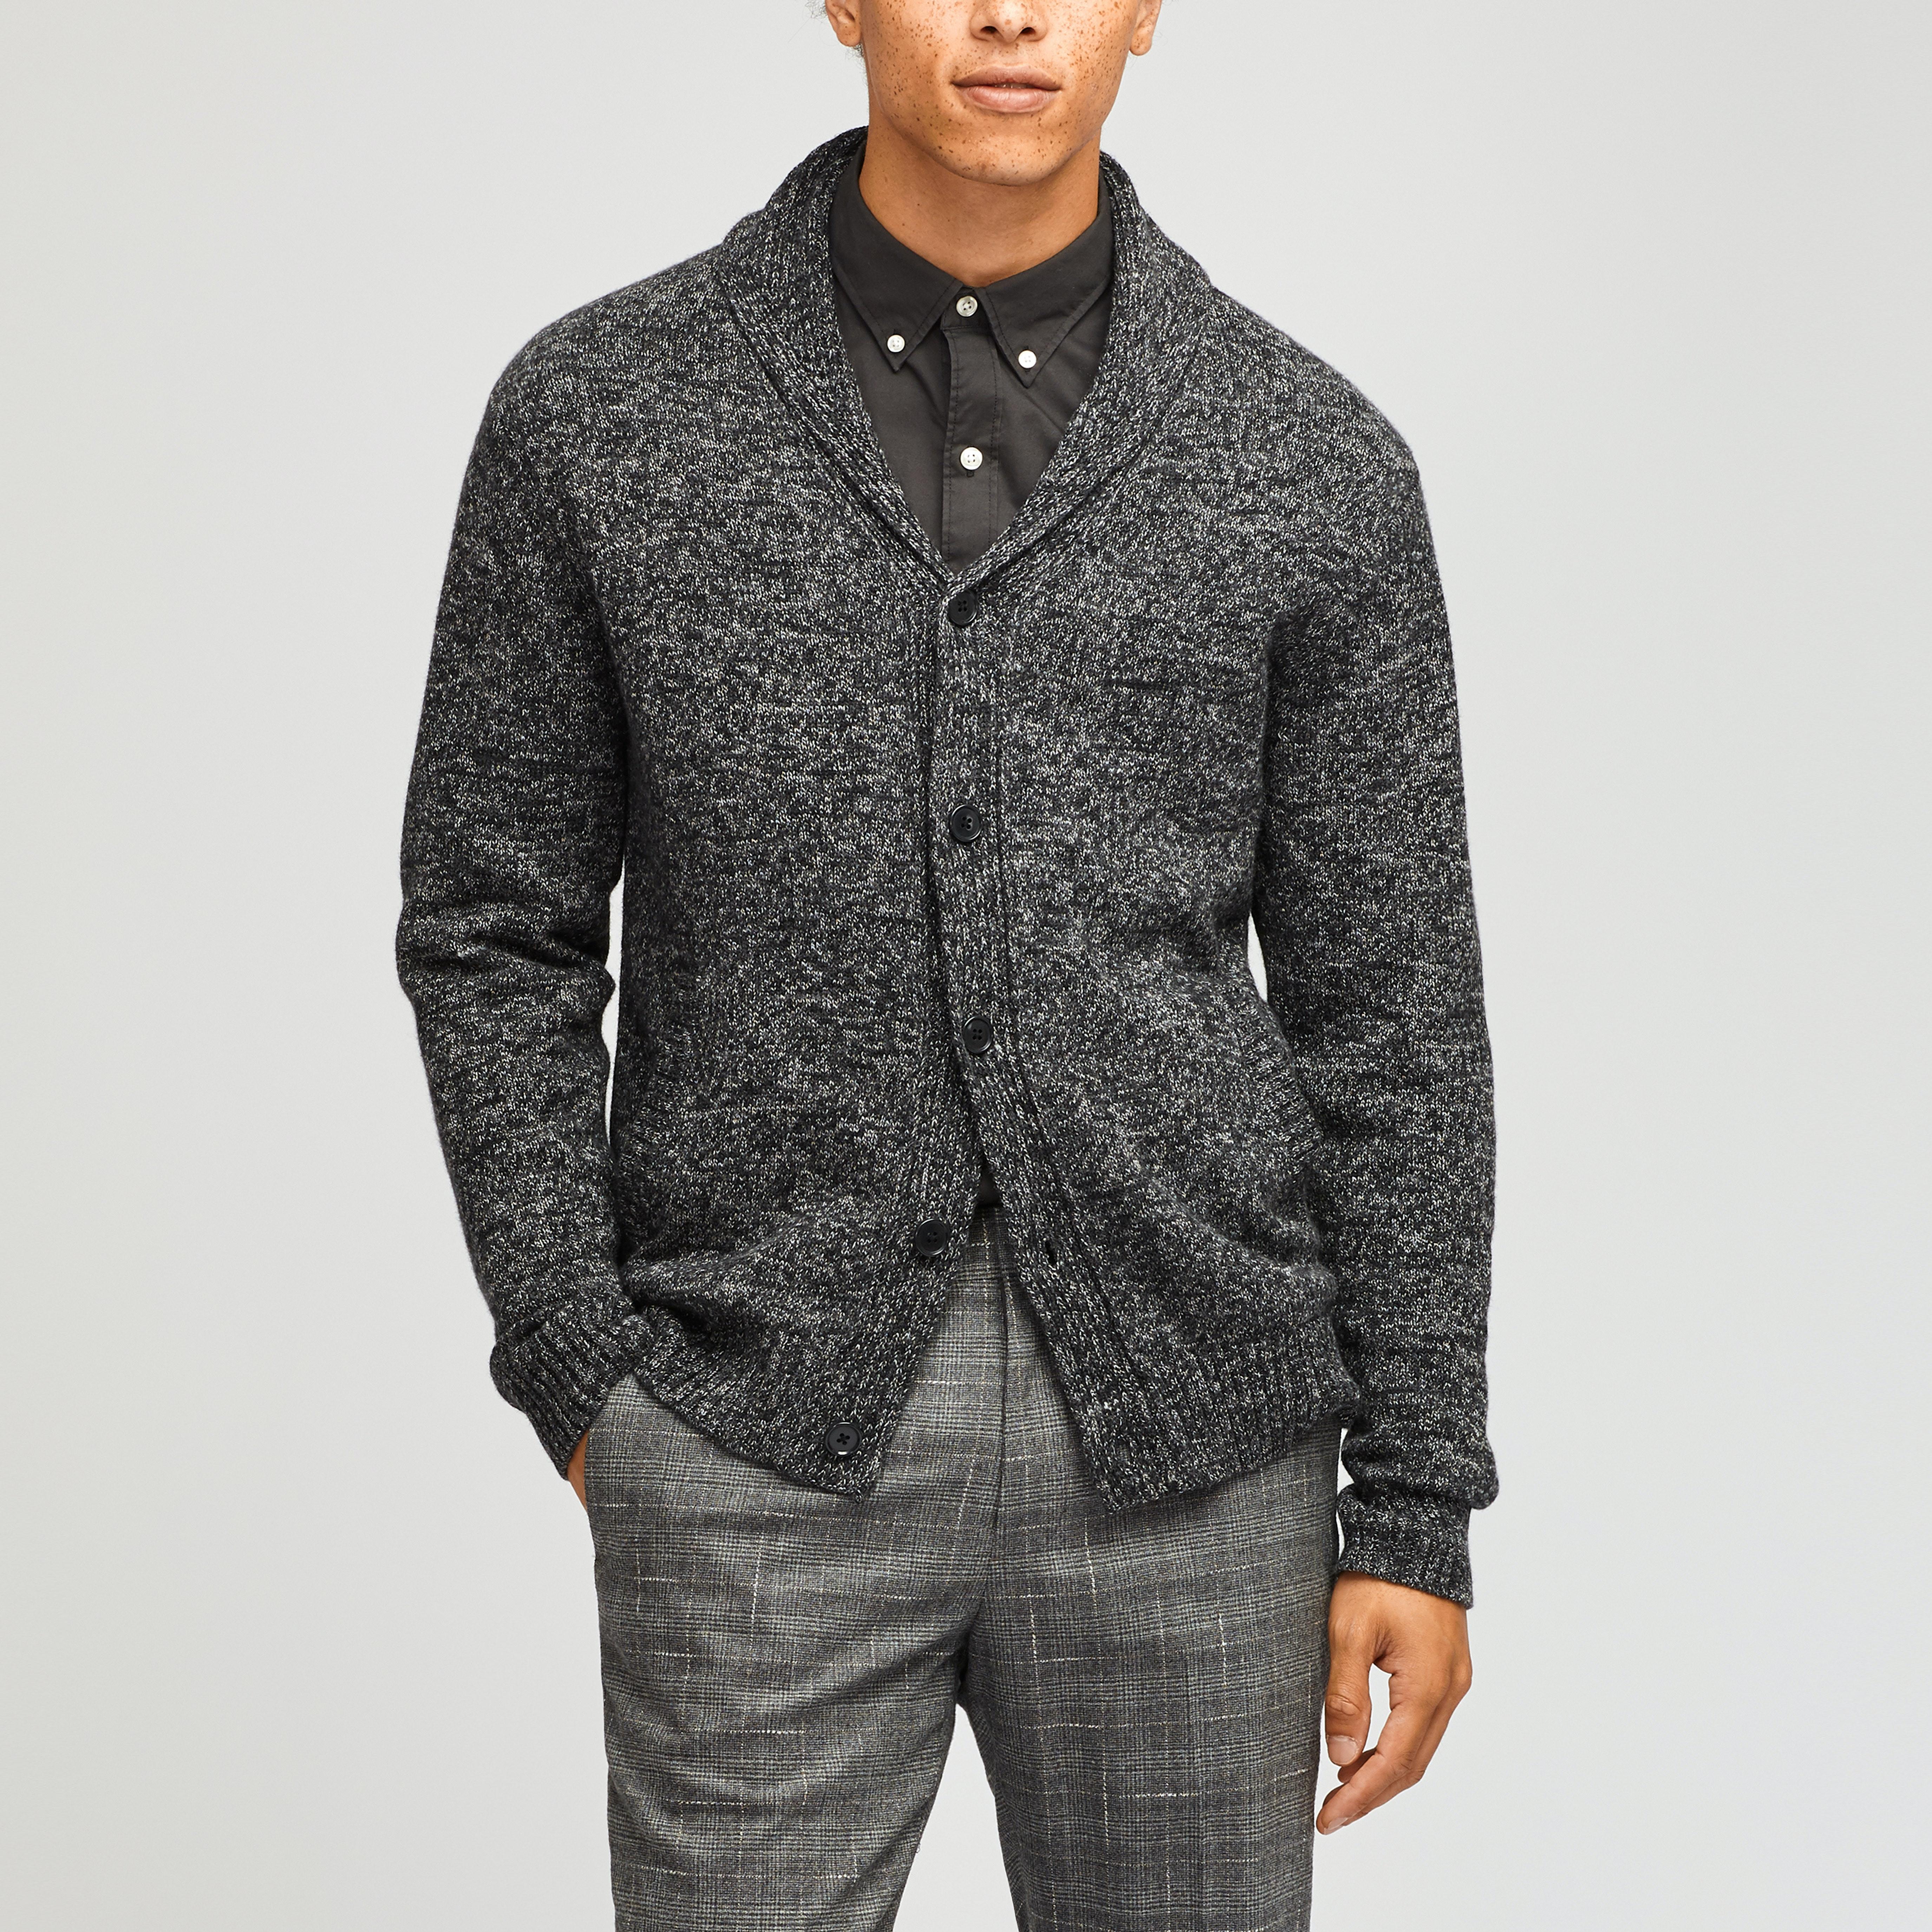 Cotton Cashmere Shawl Cardigan